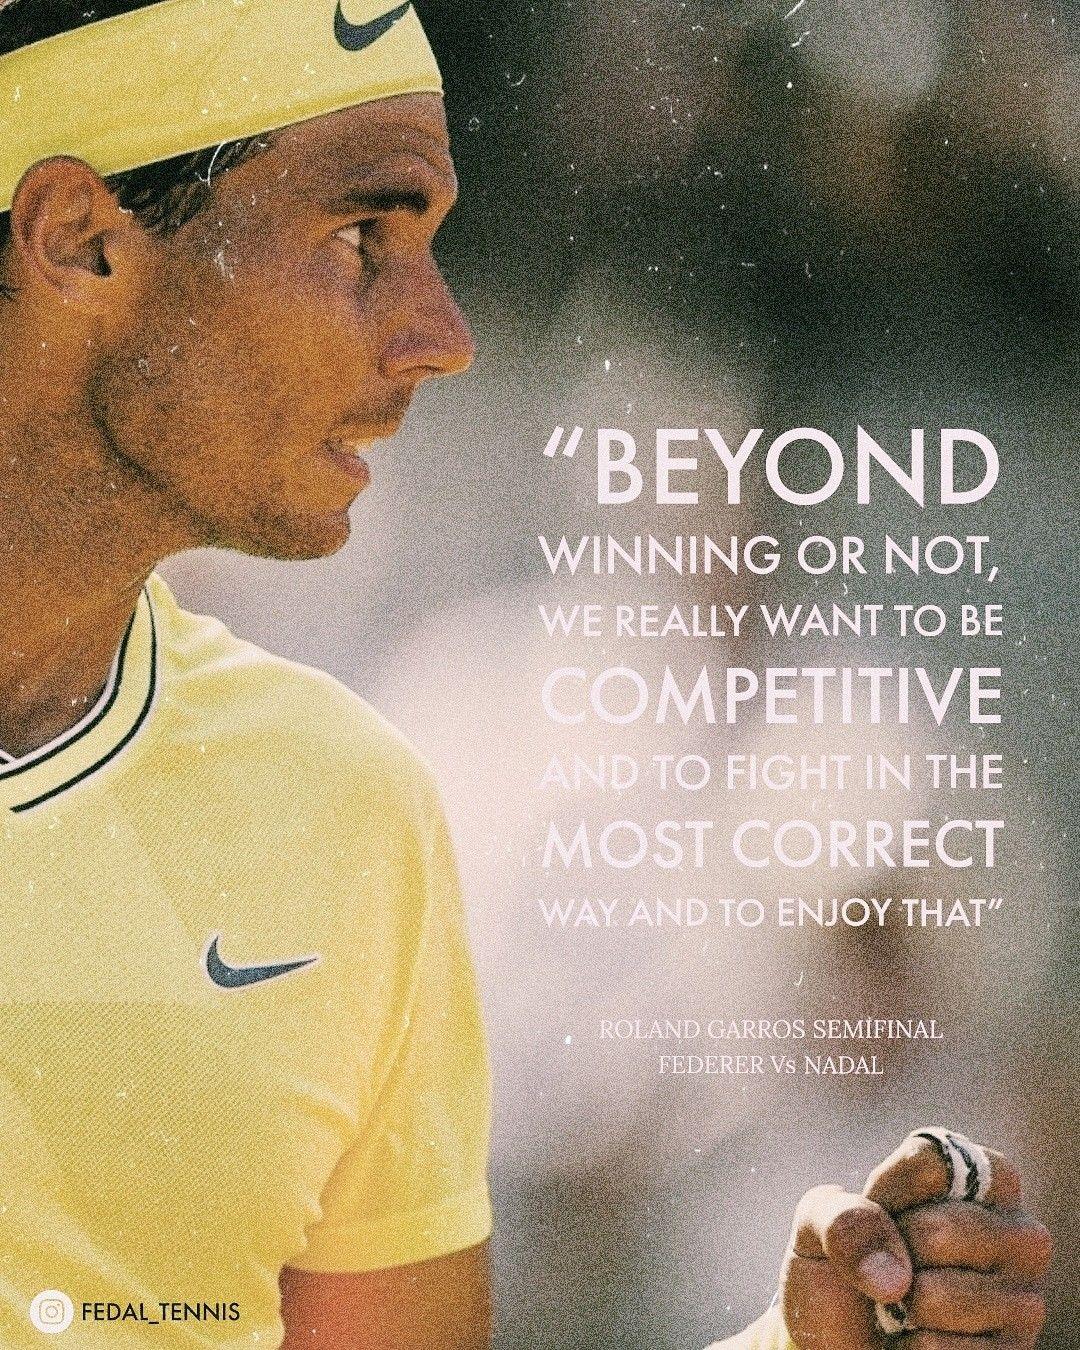 Fedal Quotes Rafael Nadal Quotes Rafael Nadal Rafael Nadal Quotes Nadal Tennis